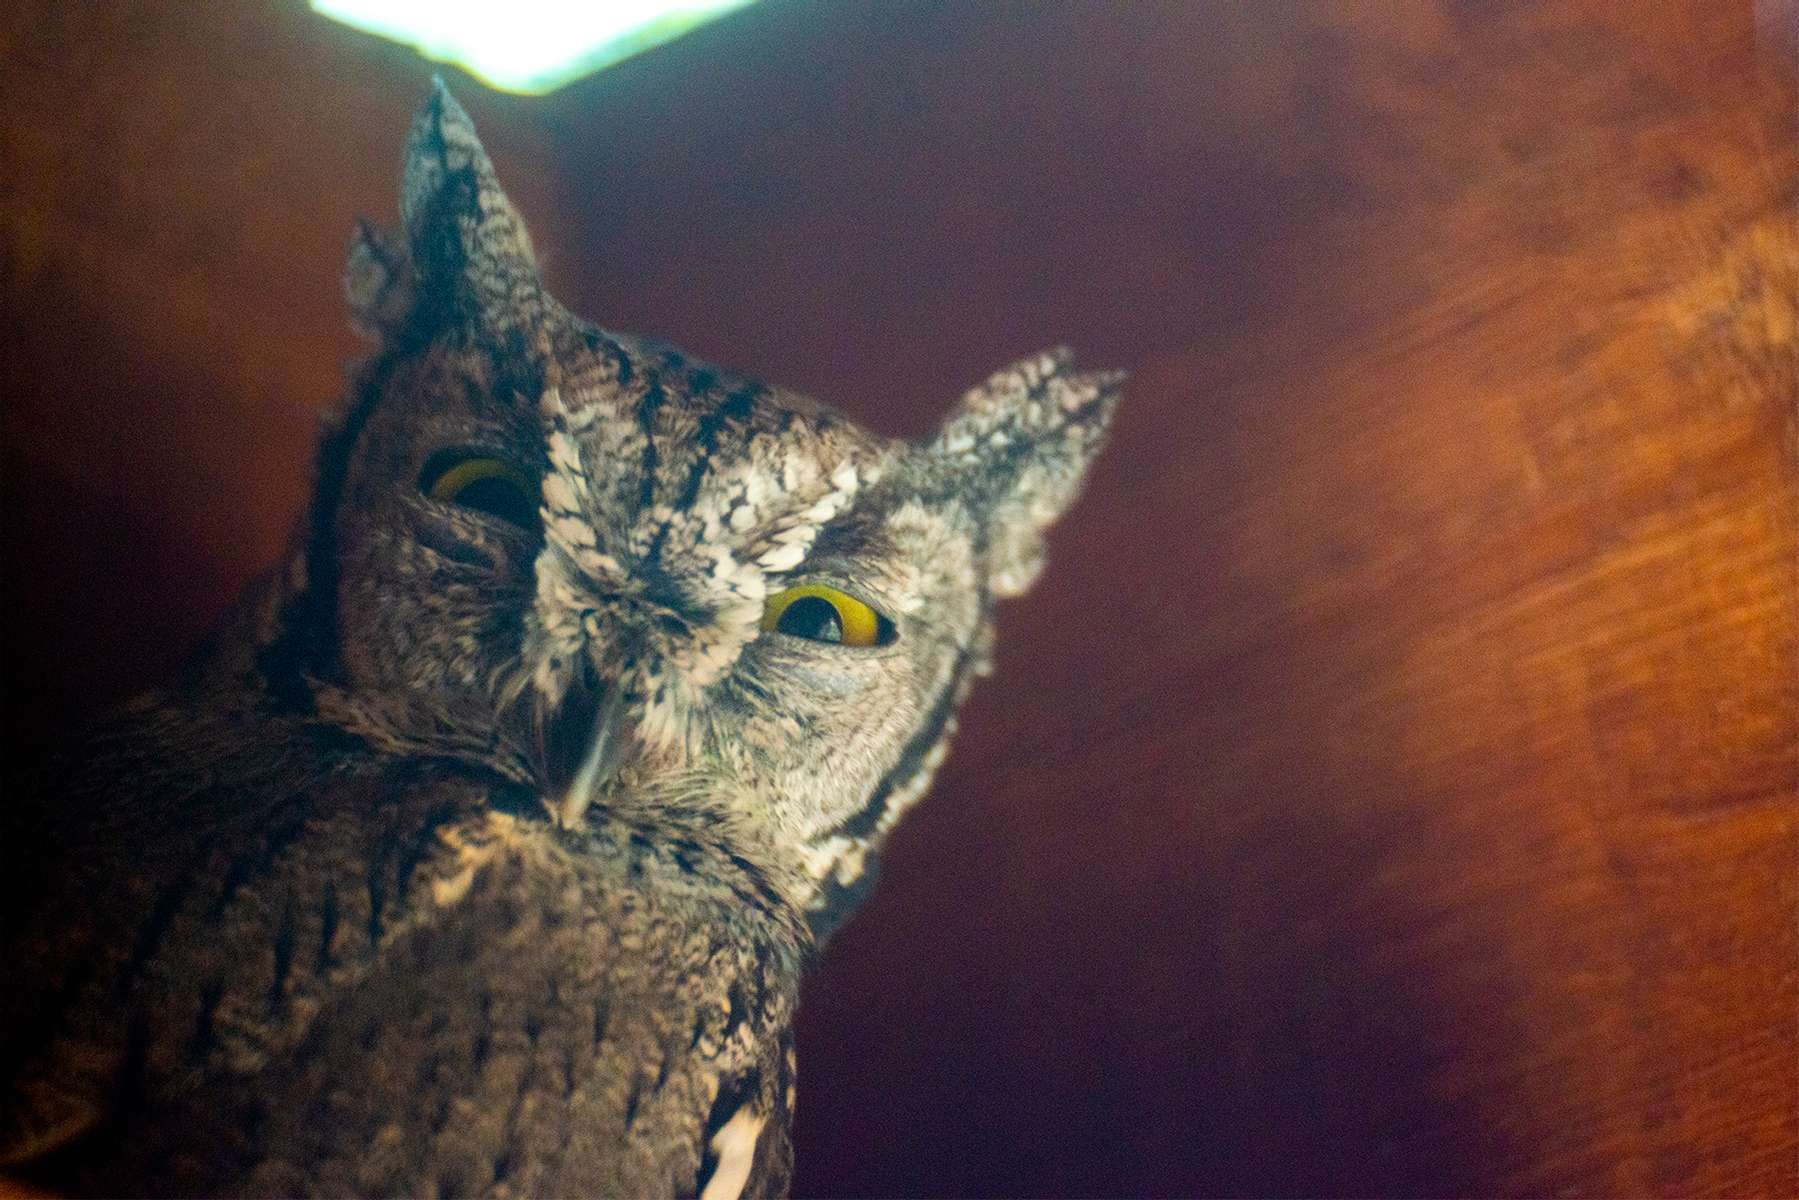 Owl-1-4x6-092620